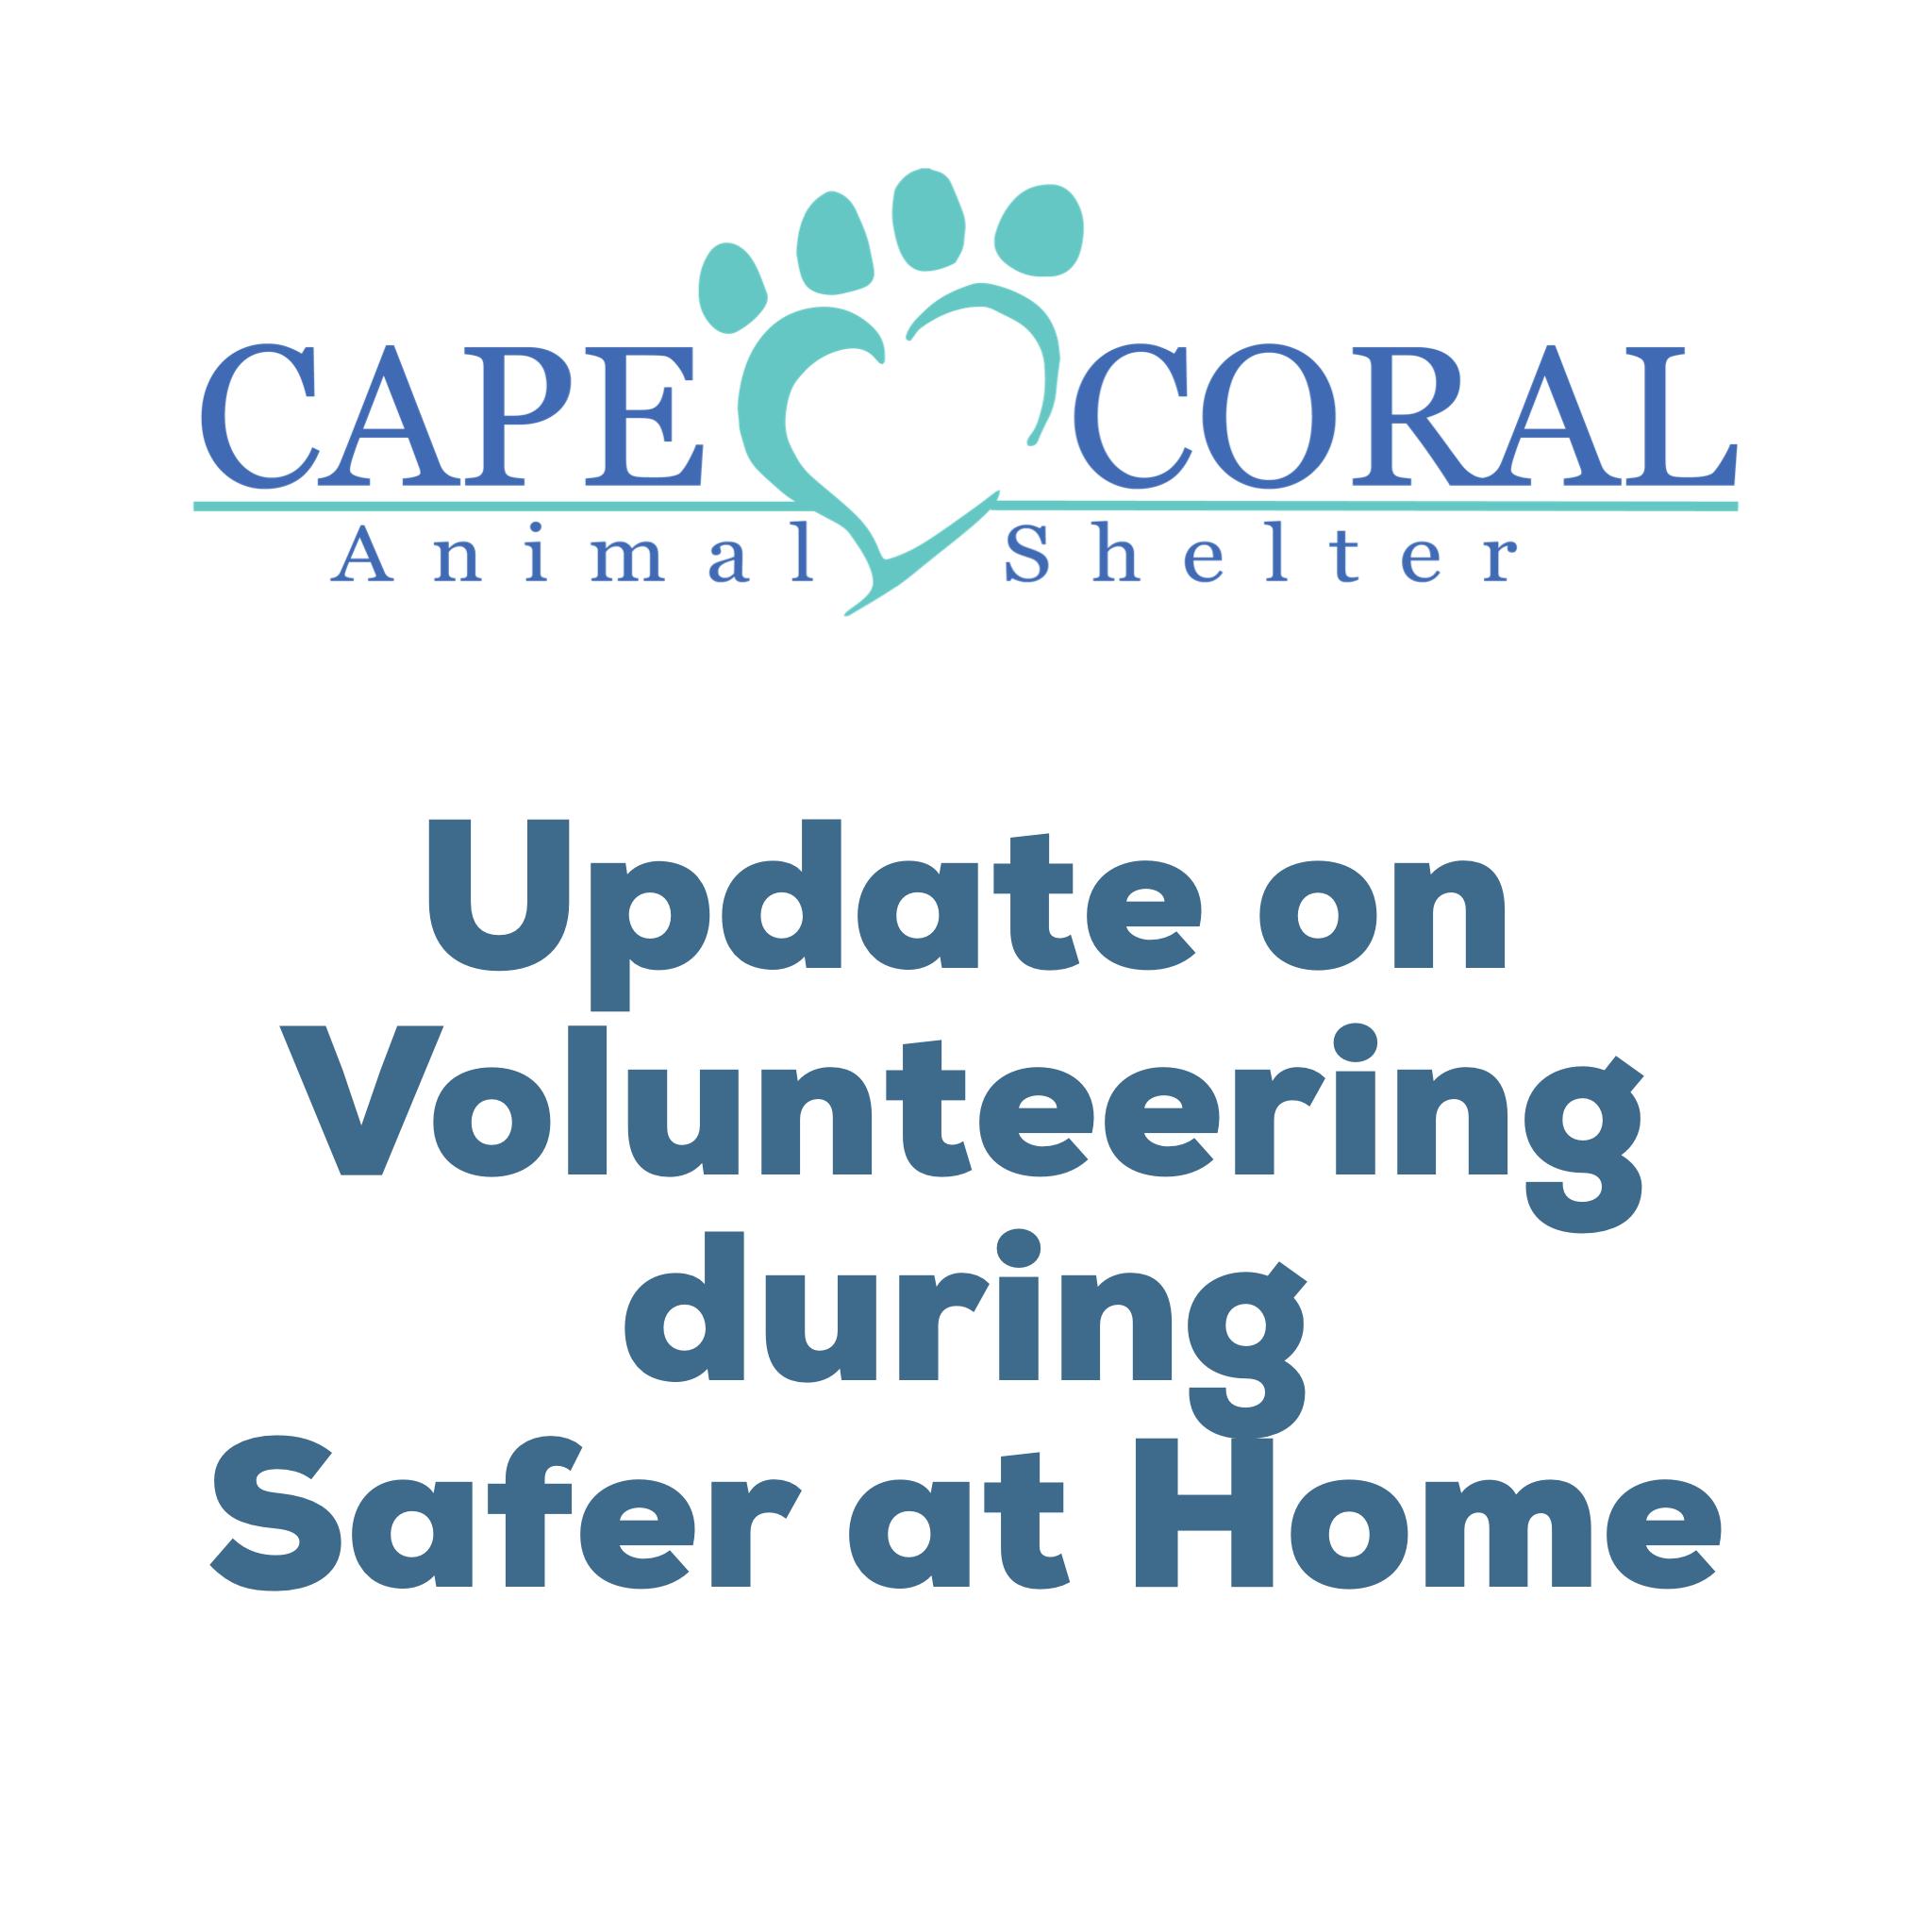 Volunteering during Safer at Home